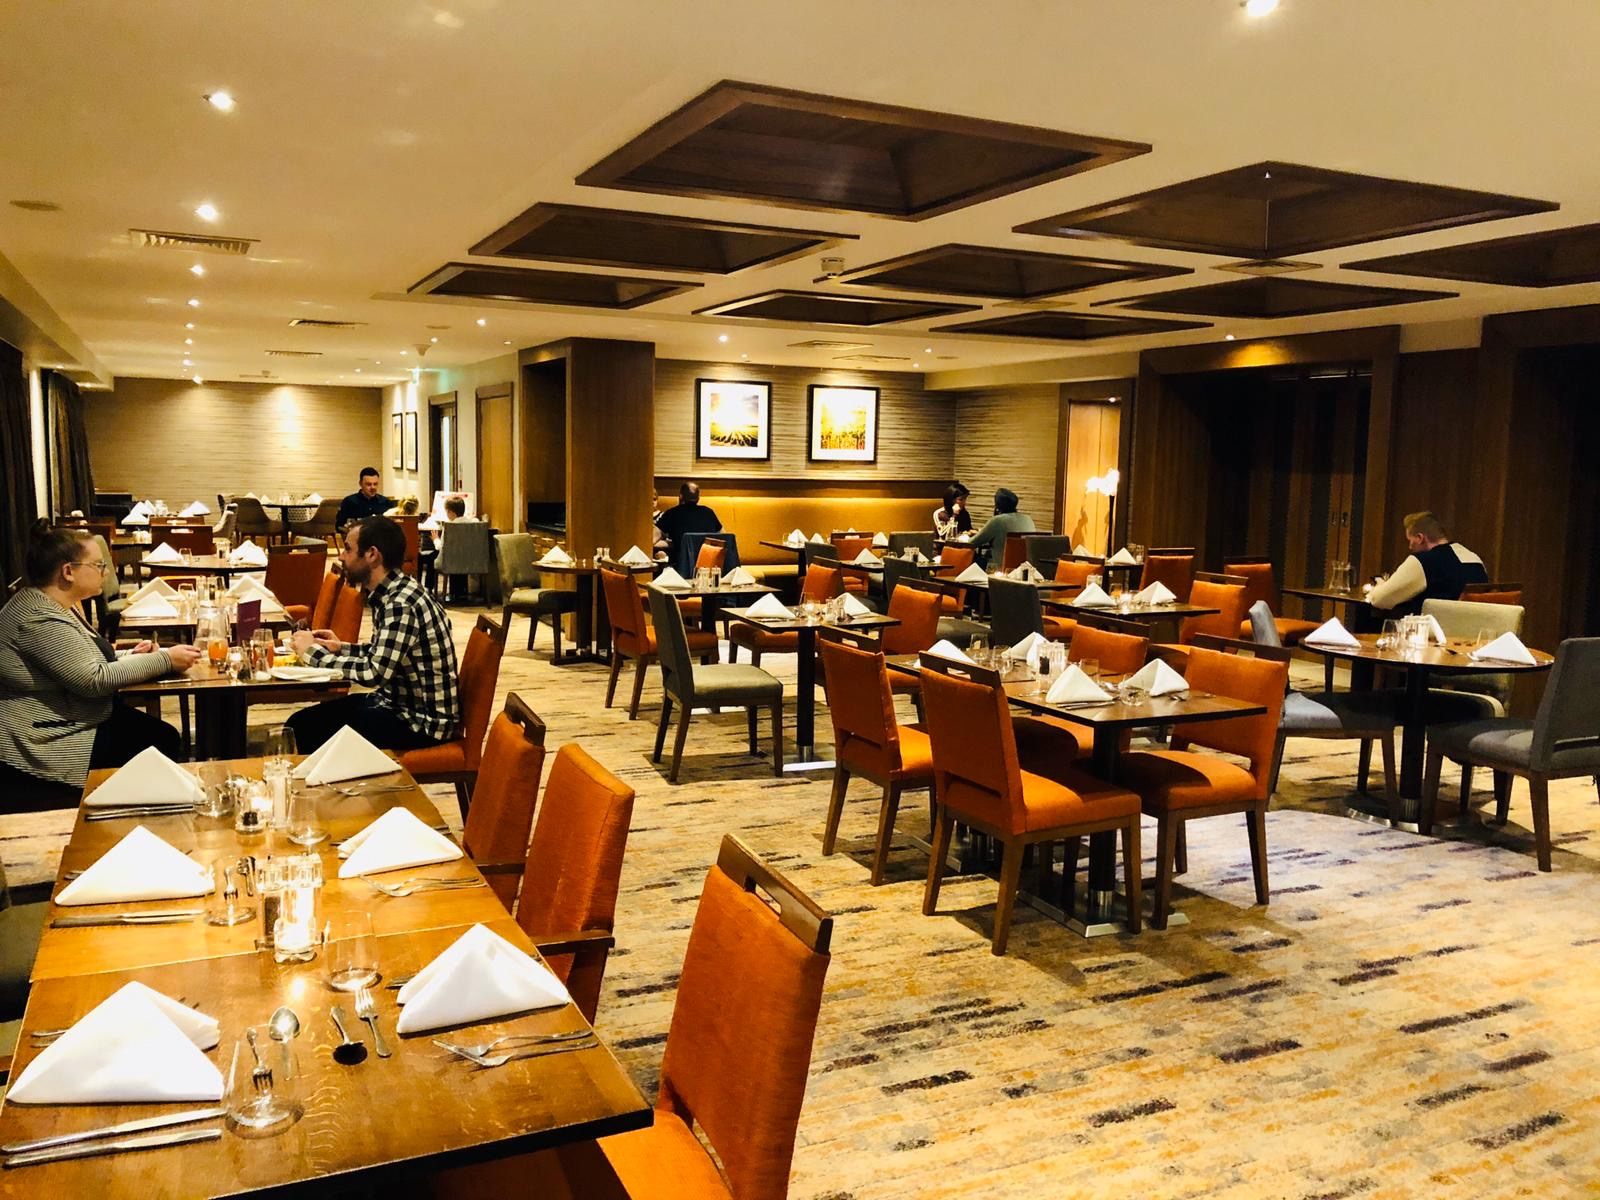 The Norton Park Hotel & Spa - A Perfect Family Getaway: Restaurant & Bar